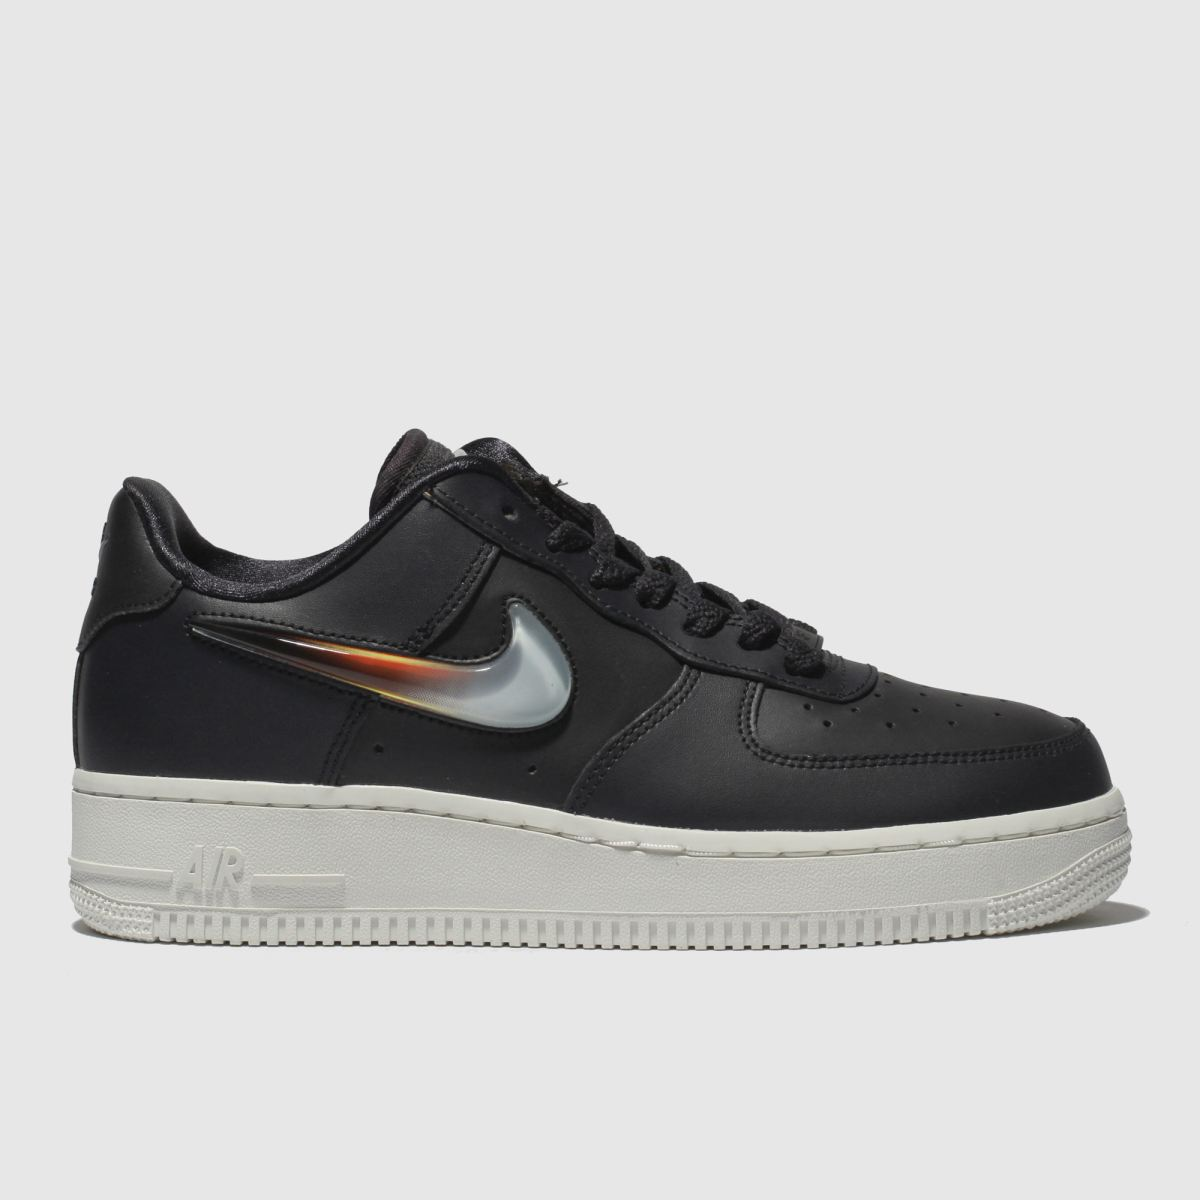 Nike Dark Grey Air Force 1 Premium Jelly Trainers